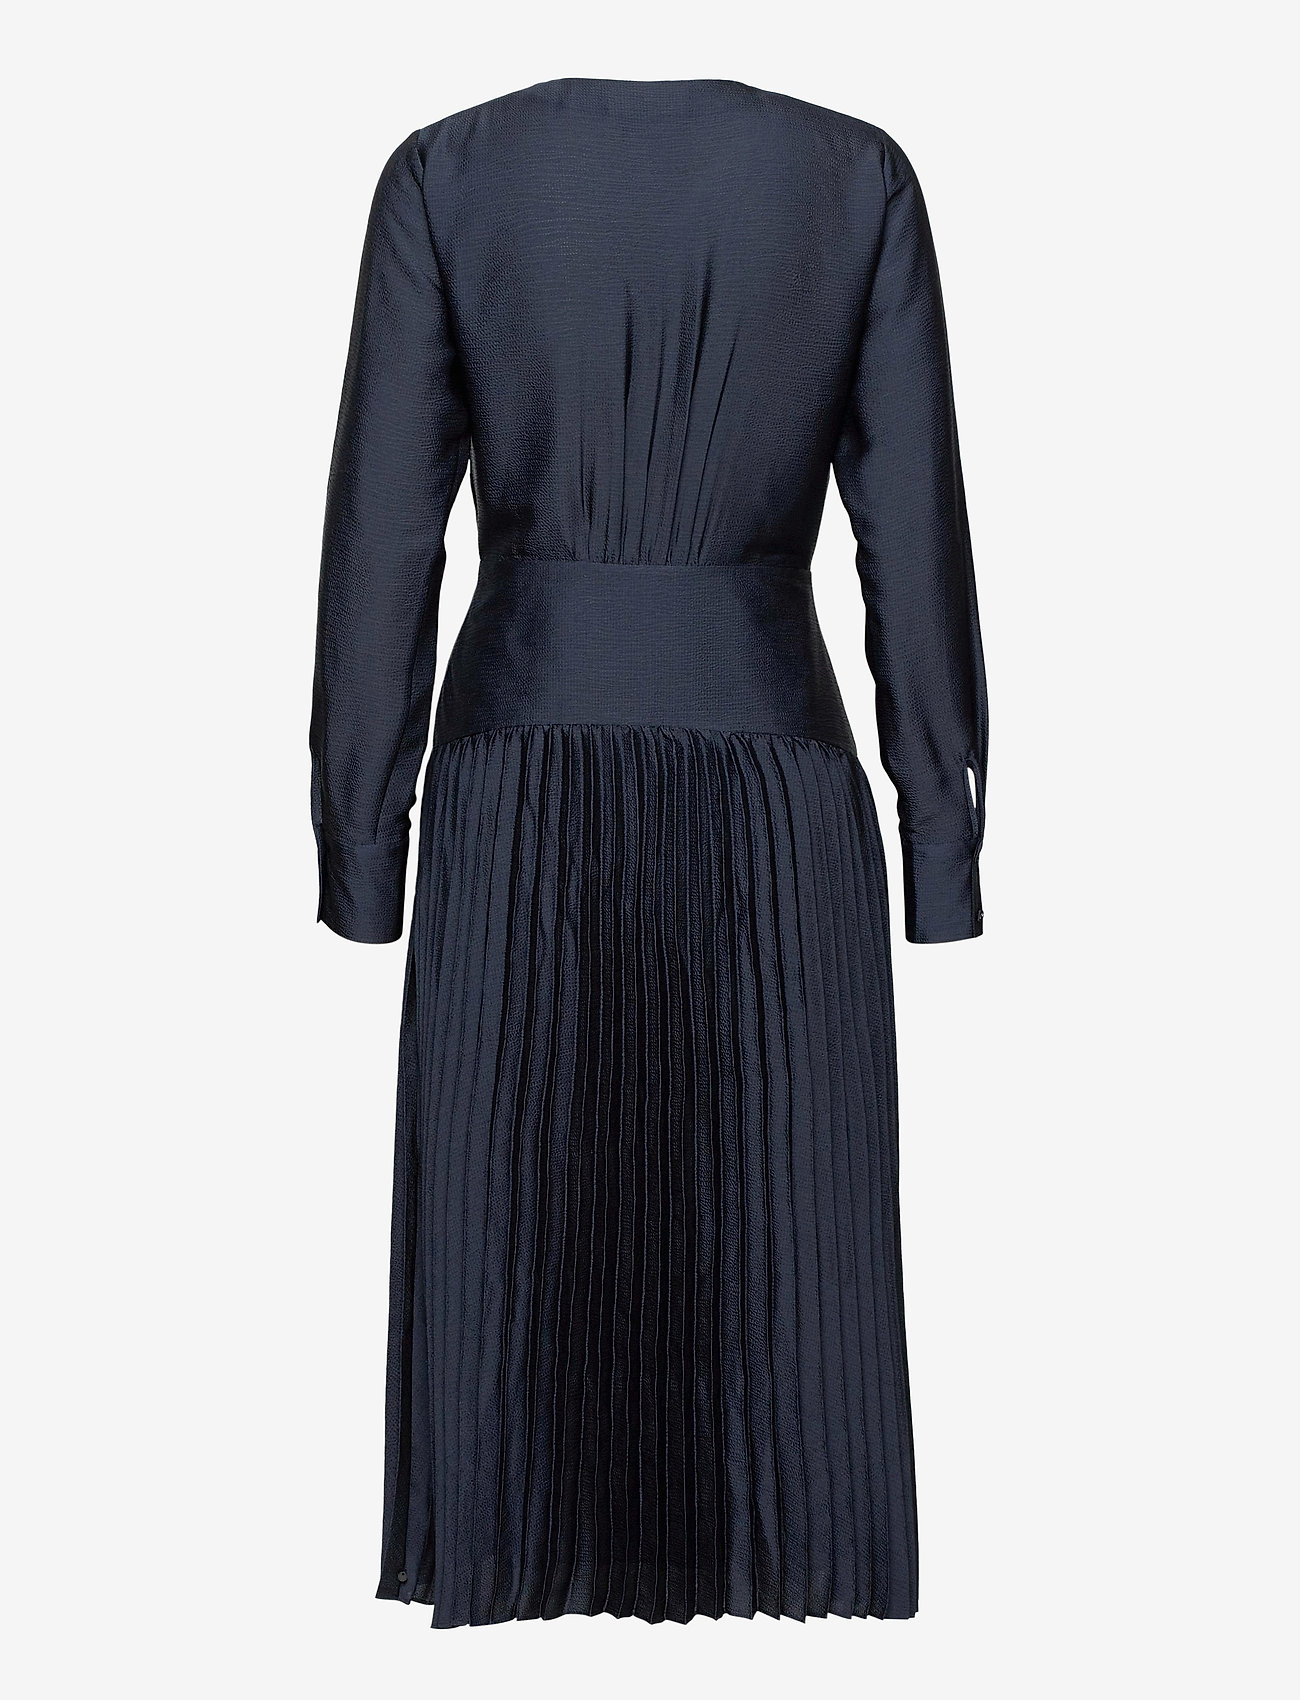 Scotch & Soda - Feminine dress with pleated skirt in structured quality - kveldskjoler - night - 1